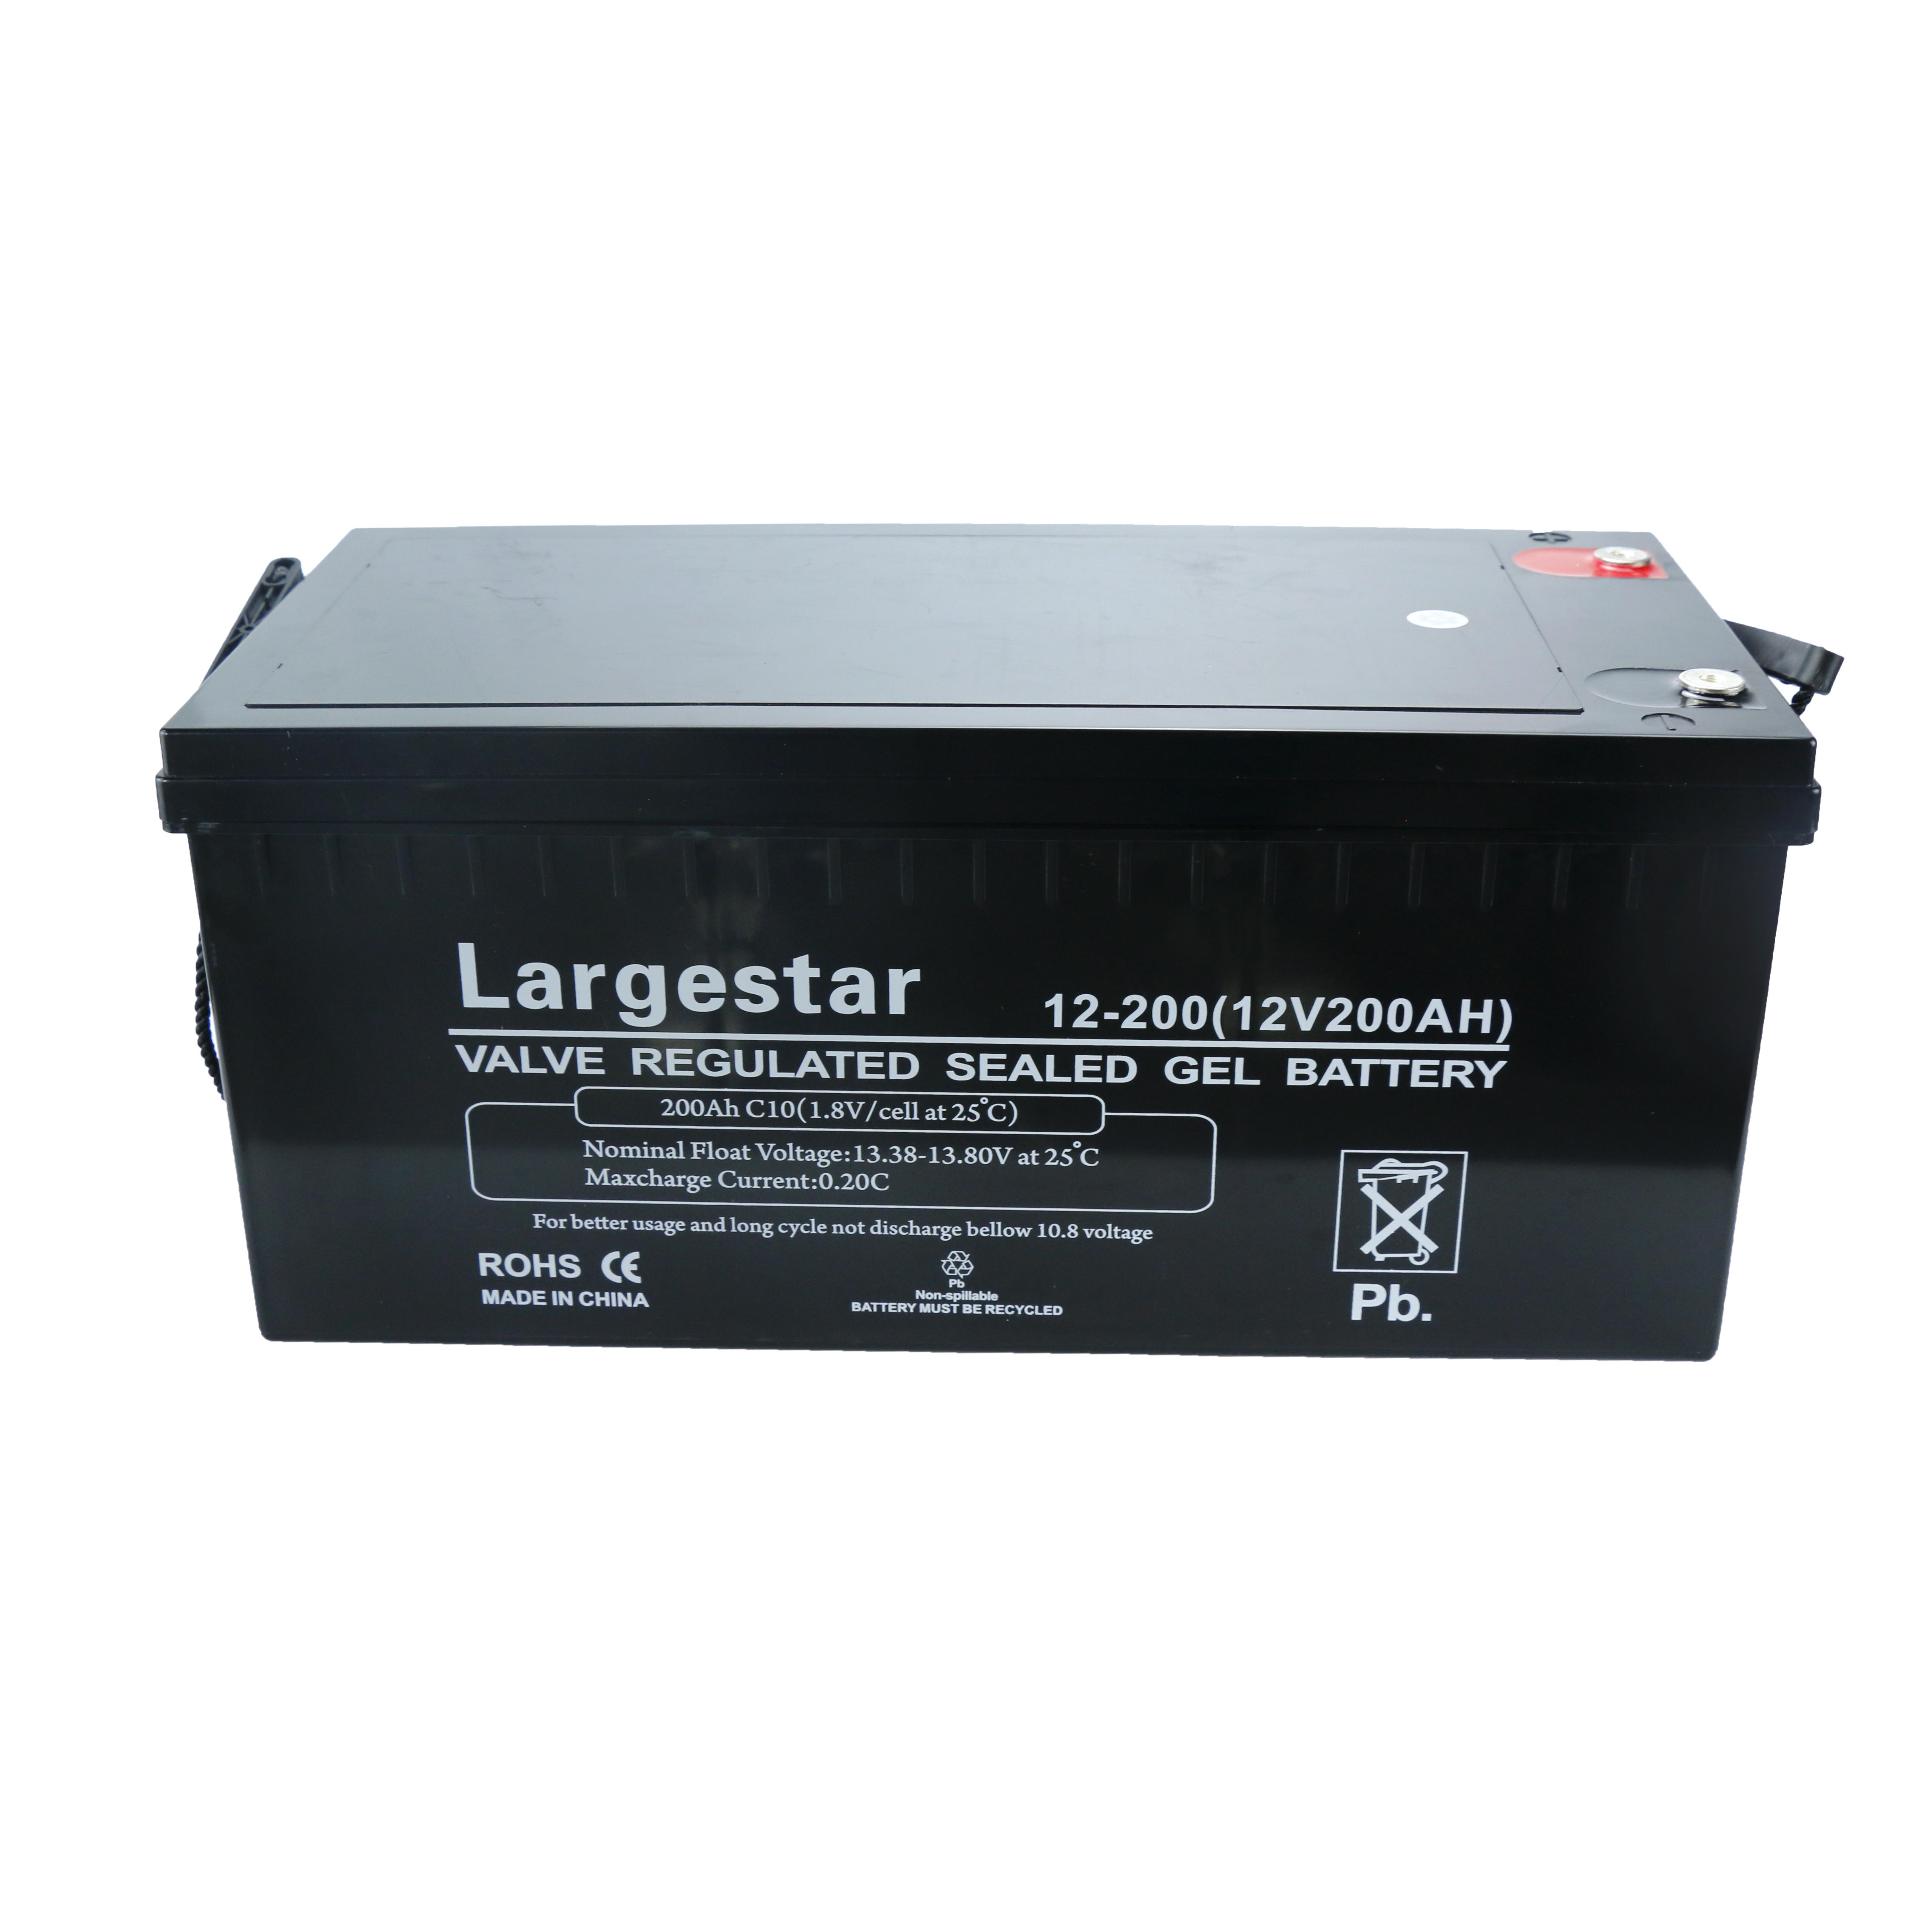 12v 200ah Lead Acid Deep Cycle Solar Power Storage Battery Buy Solar Battery Vrla Battery 12v Battery Product On Zhejiang Just Electrical Appliances Co Ltd